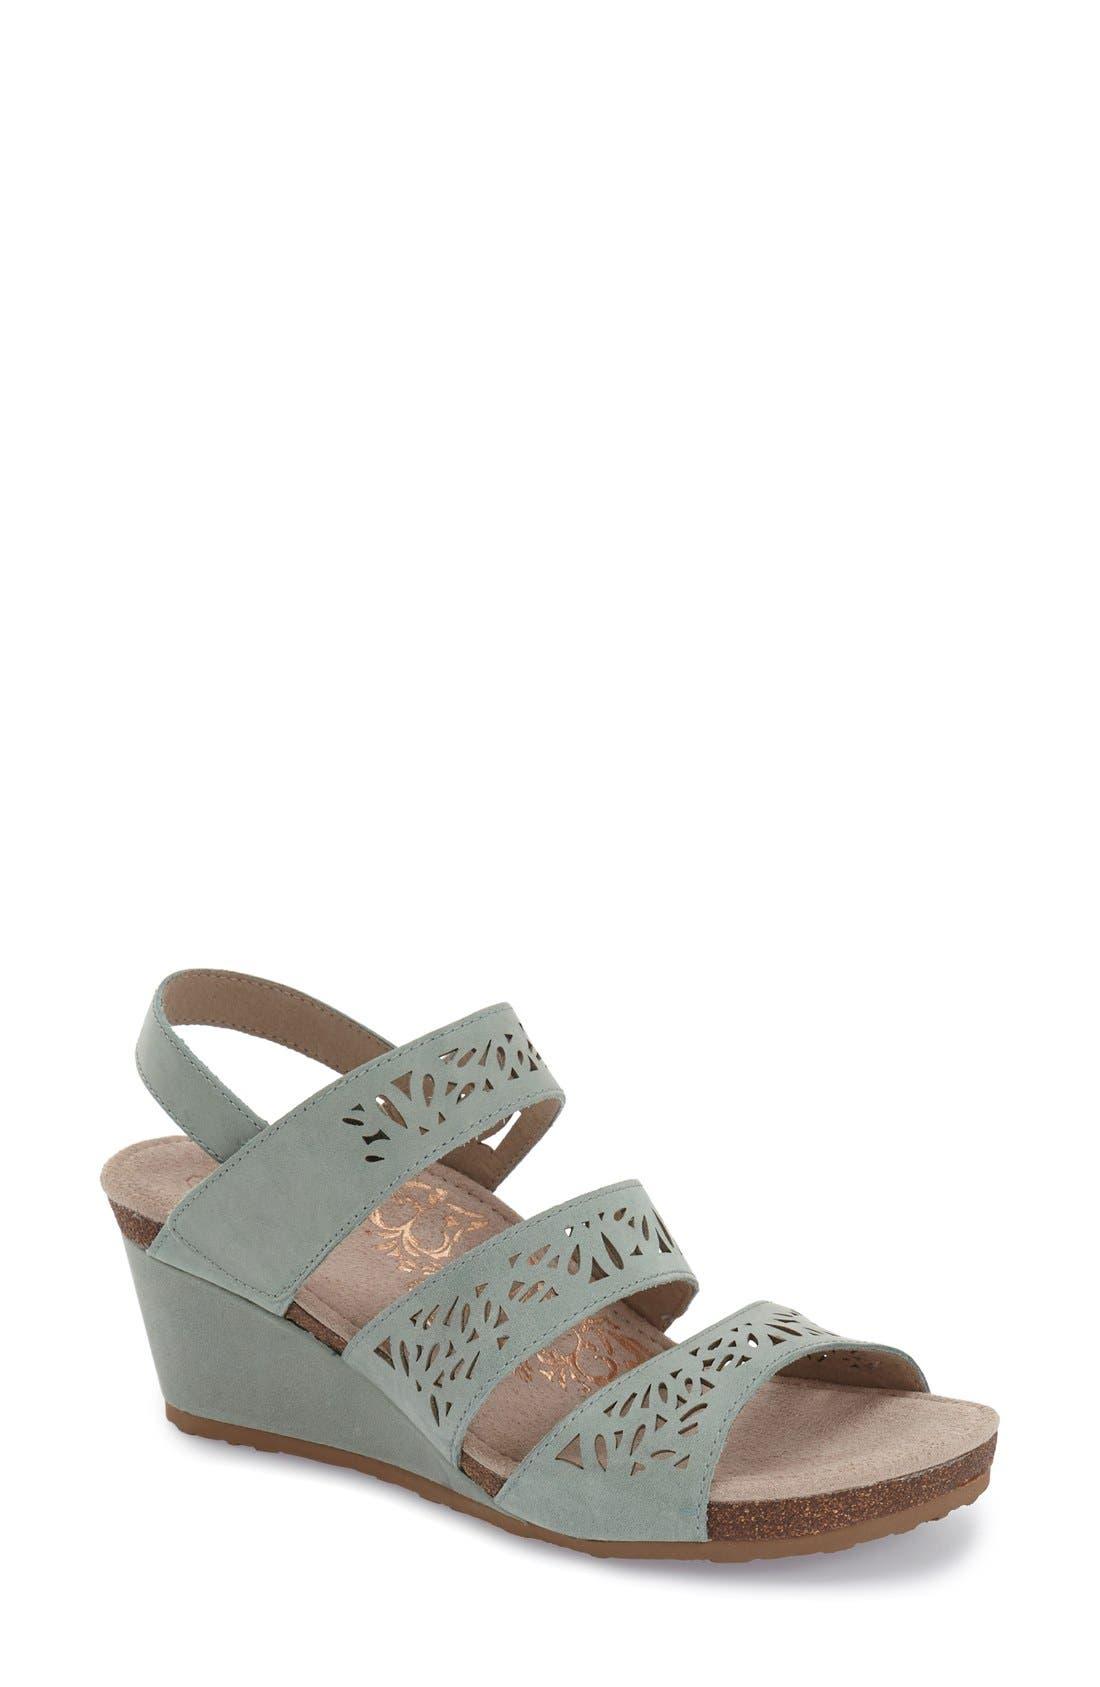 Aetrex 'Lexi' Wedge Sandal (Women)